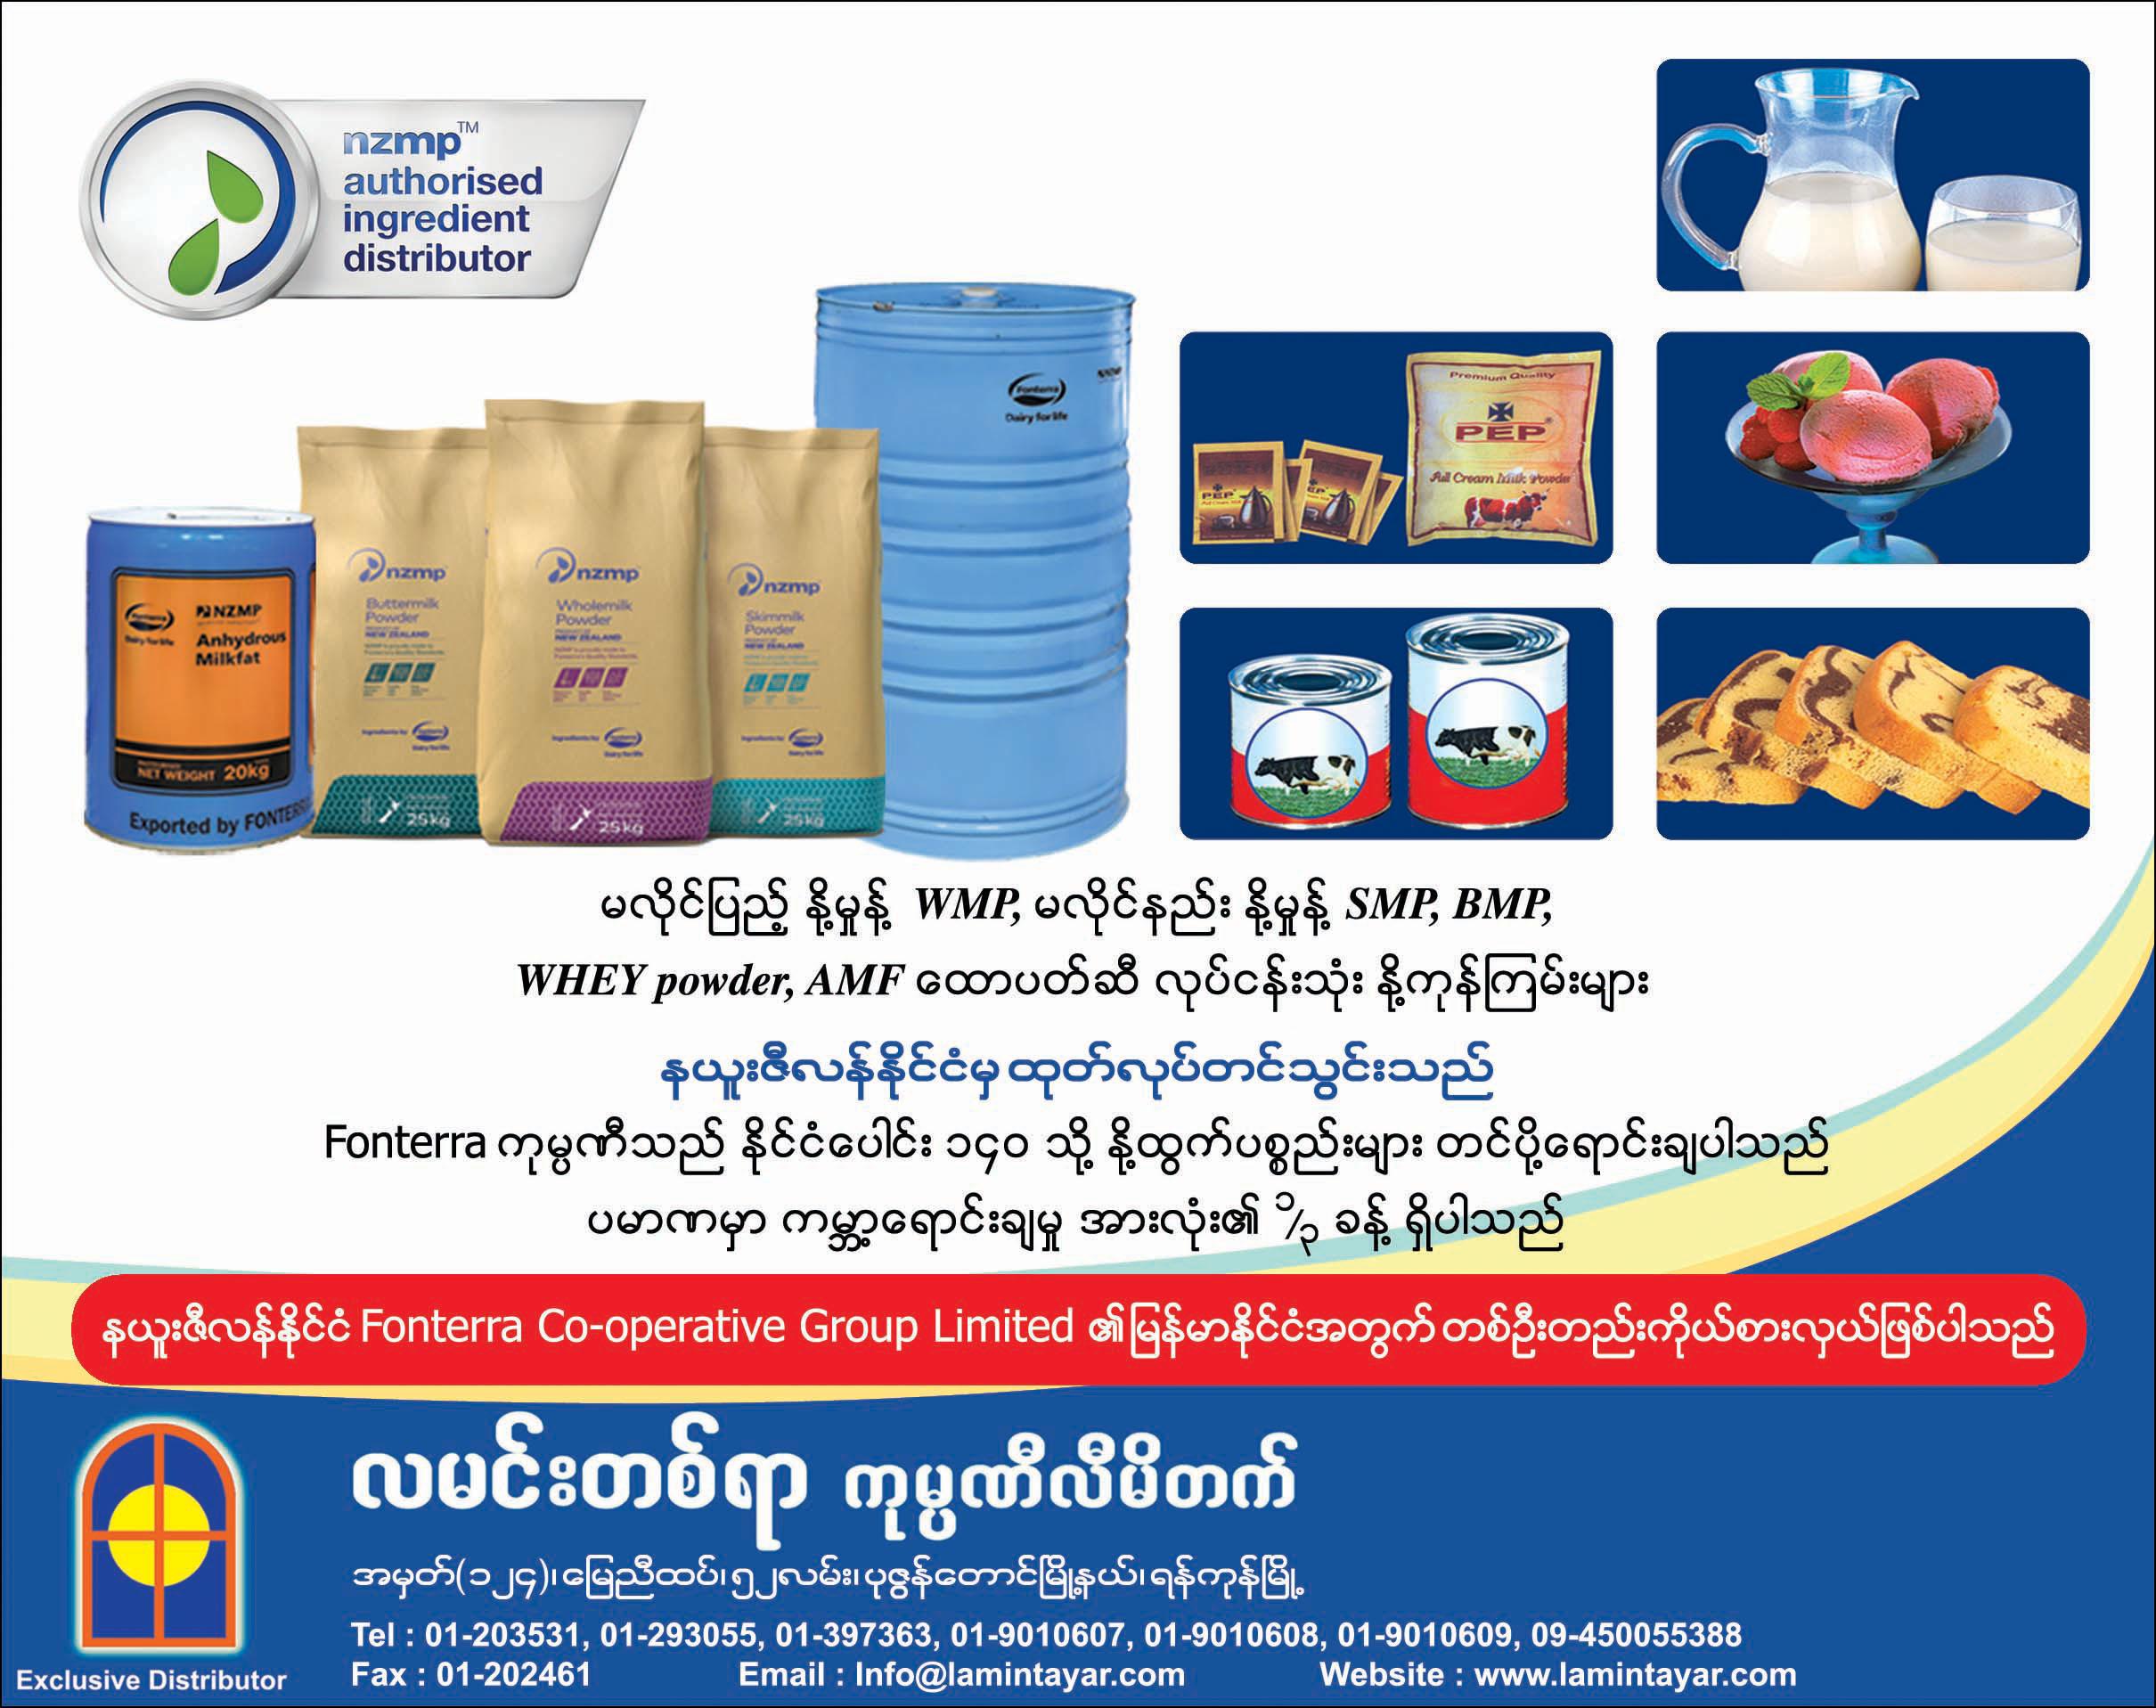 Lamintayar Co., Ltd.